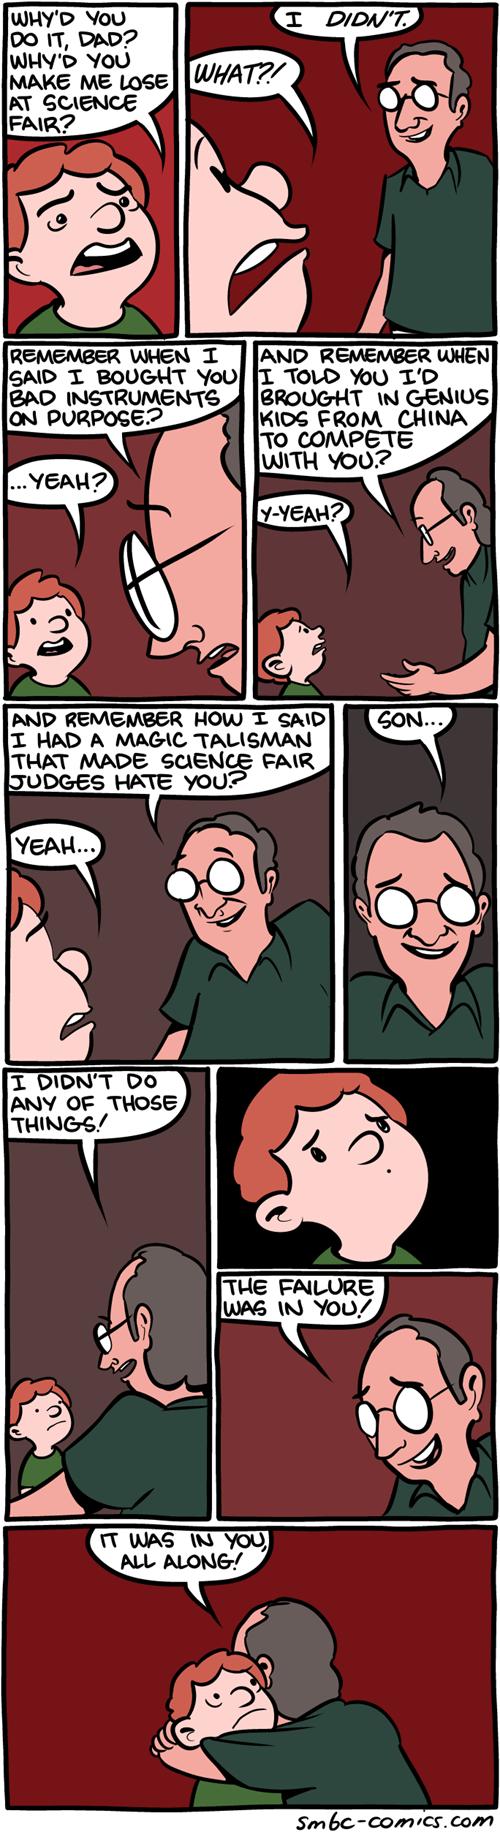 dads failure school kids science web comics - 8218295552